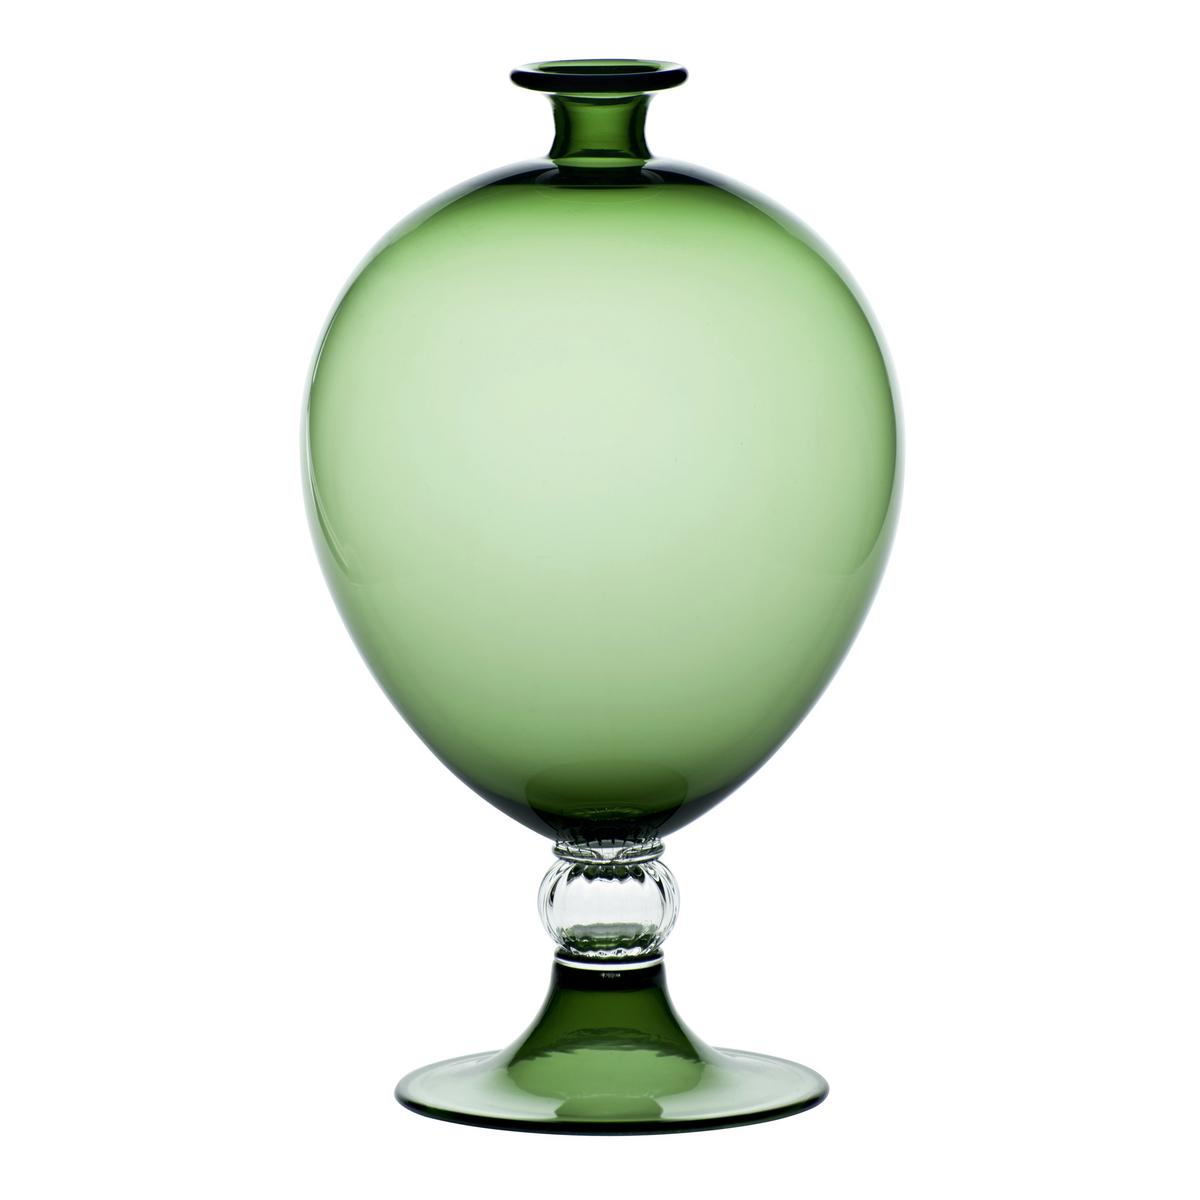 Venini Veronese Vase Apple Green Artedona